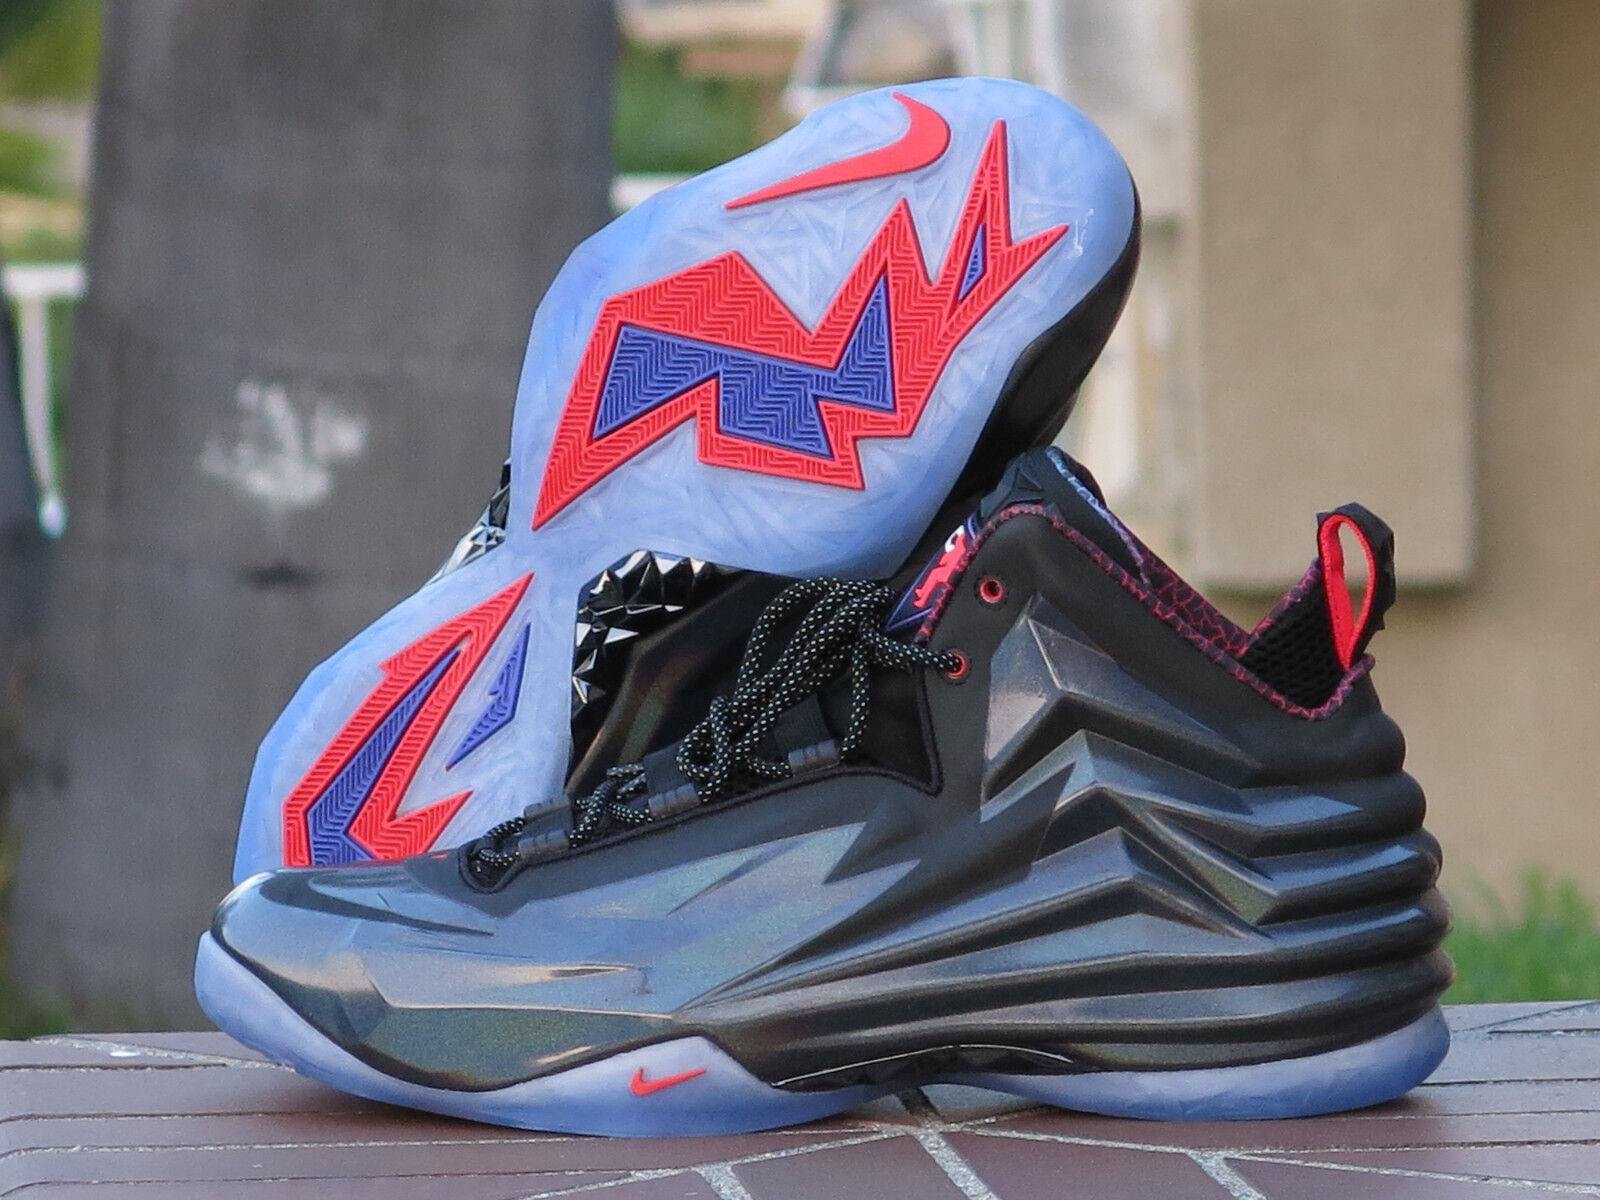 2014 NIKE Chuck Foam Posite Men's Basketball Shoes 684758-501 SZ 10